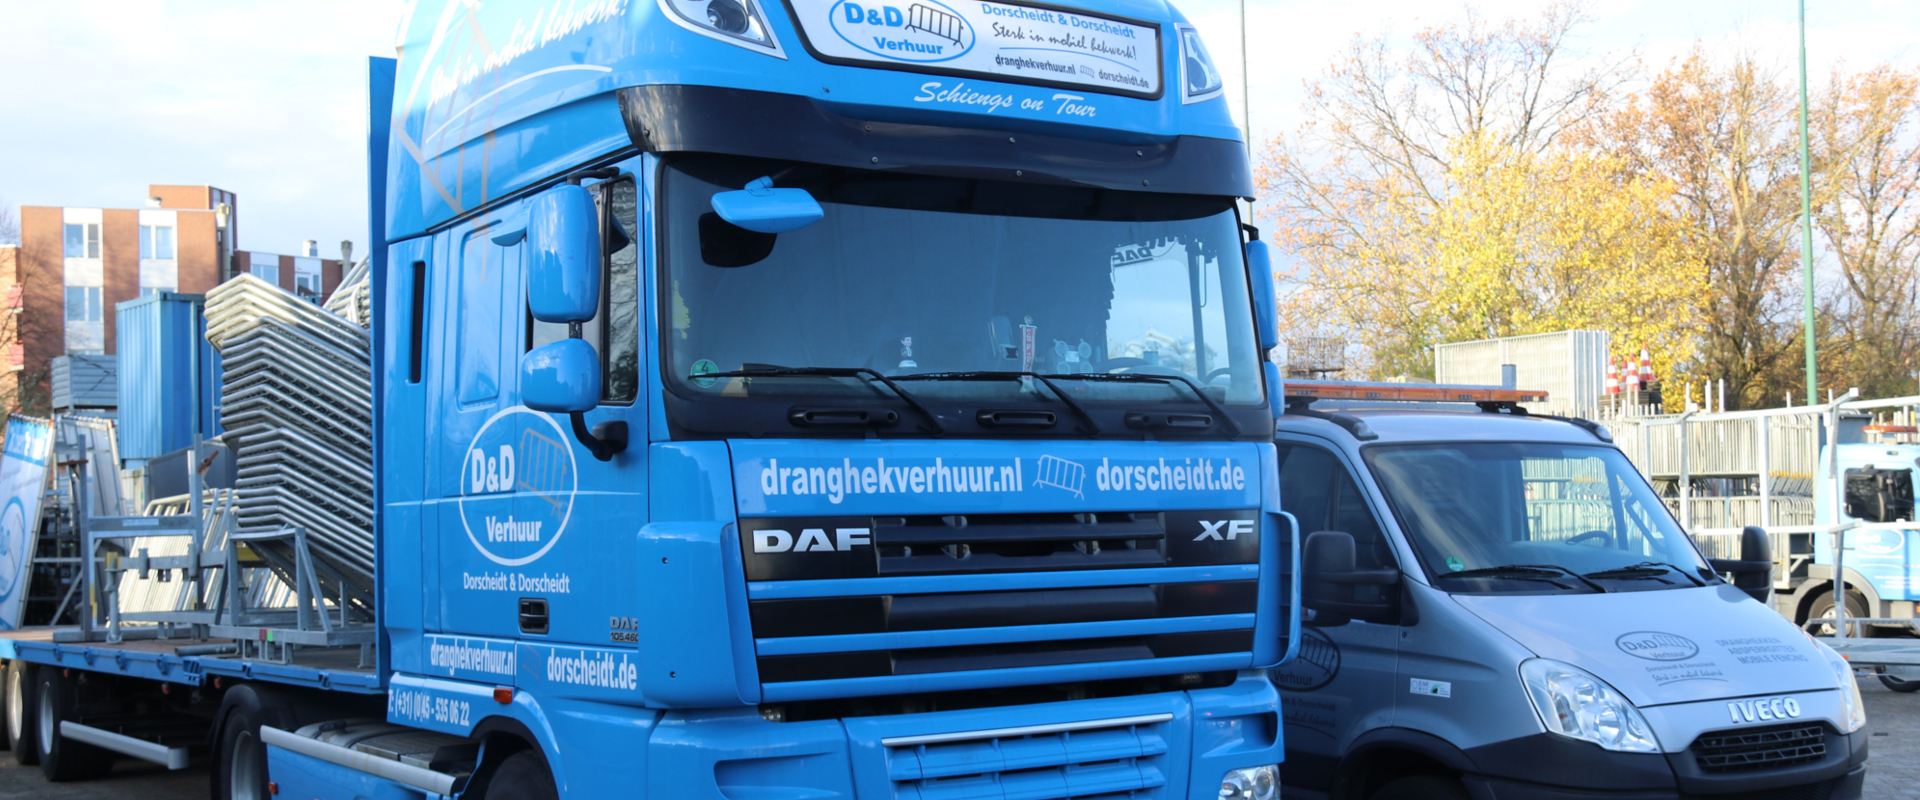 truck D&D verhuur